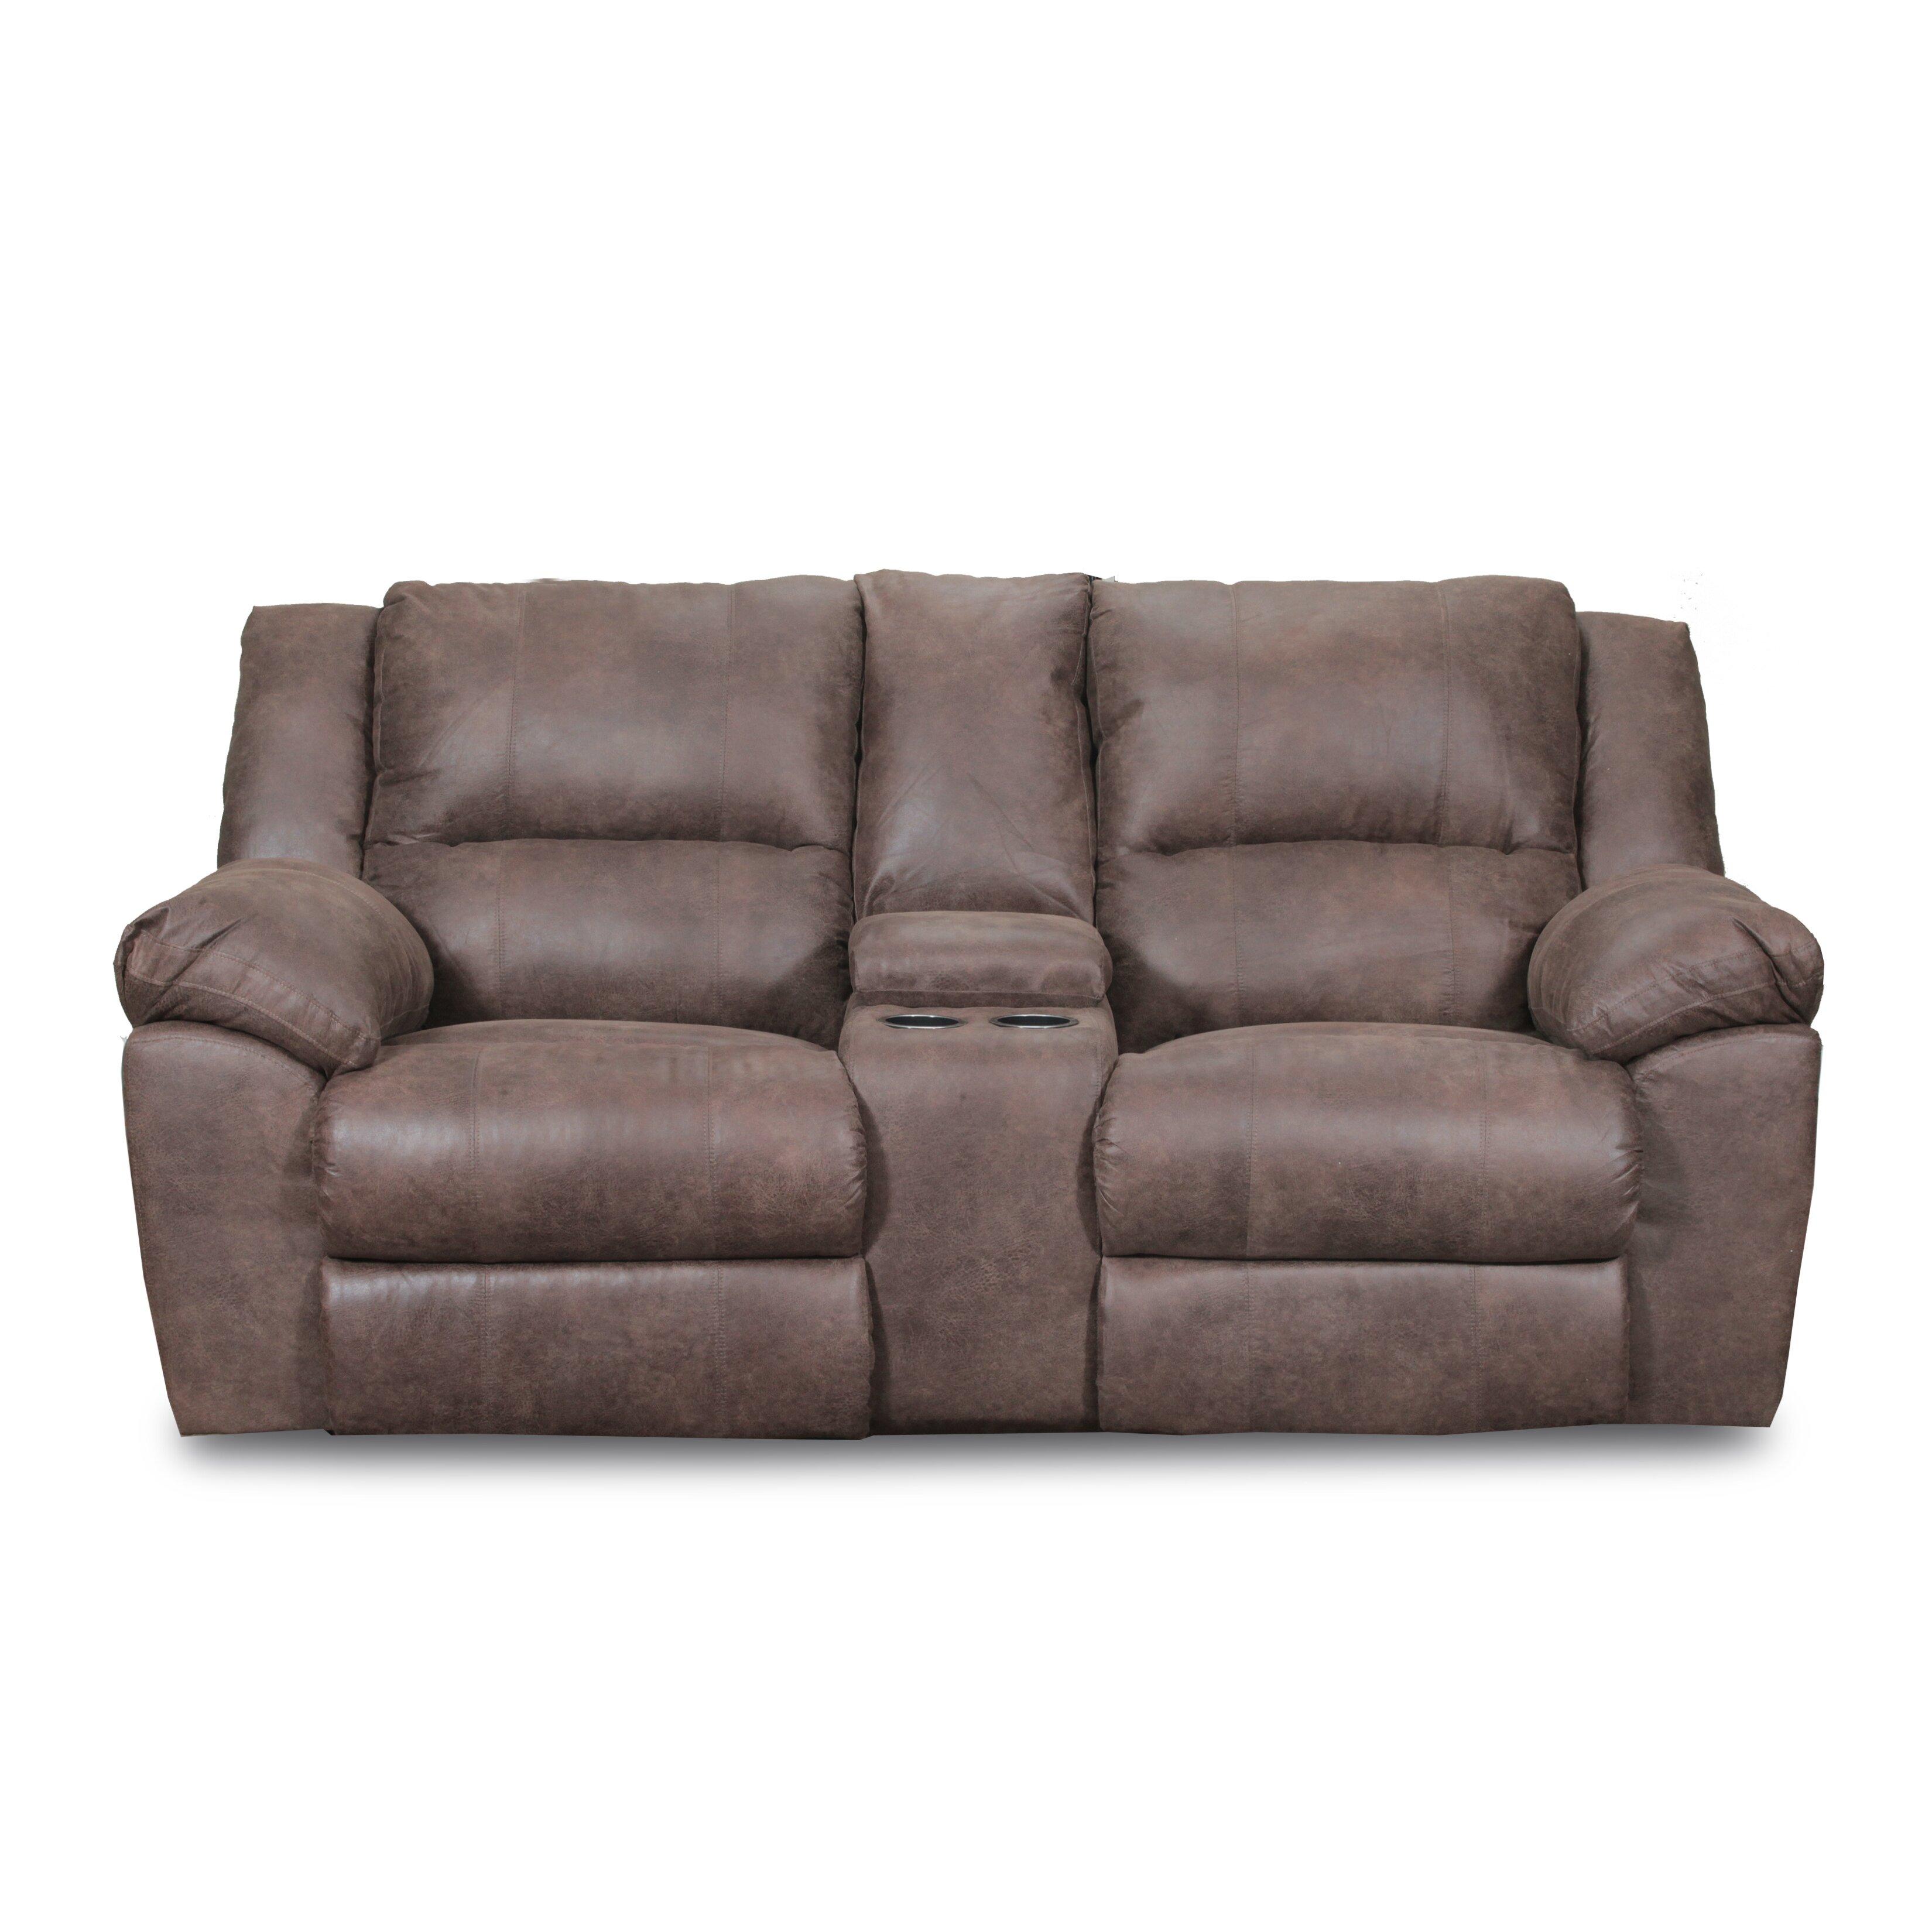 Simmons Upholstery Phoenix Mocha Living Room Collection